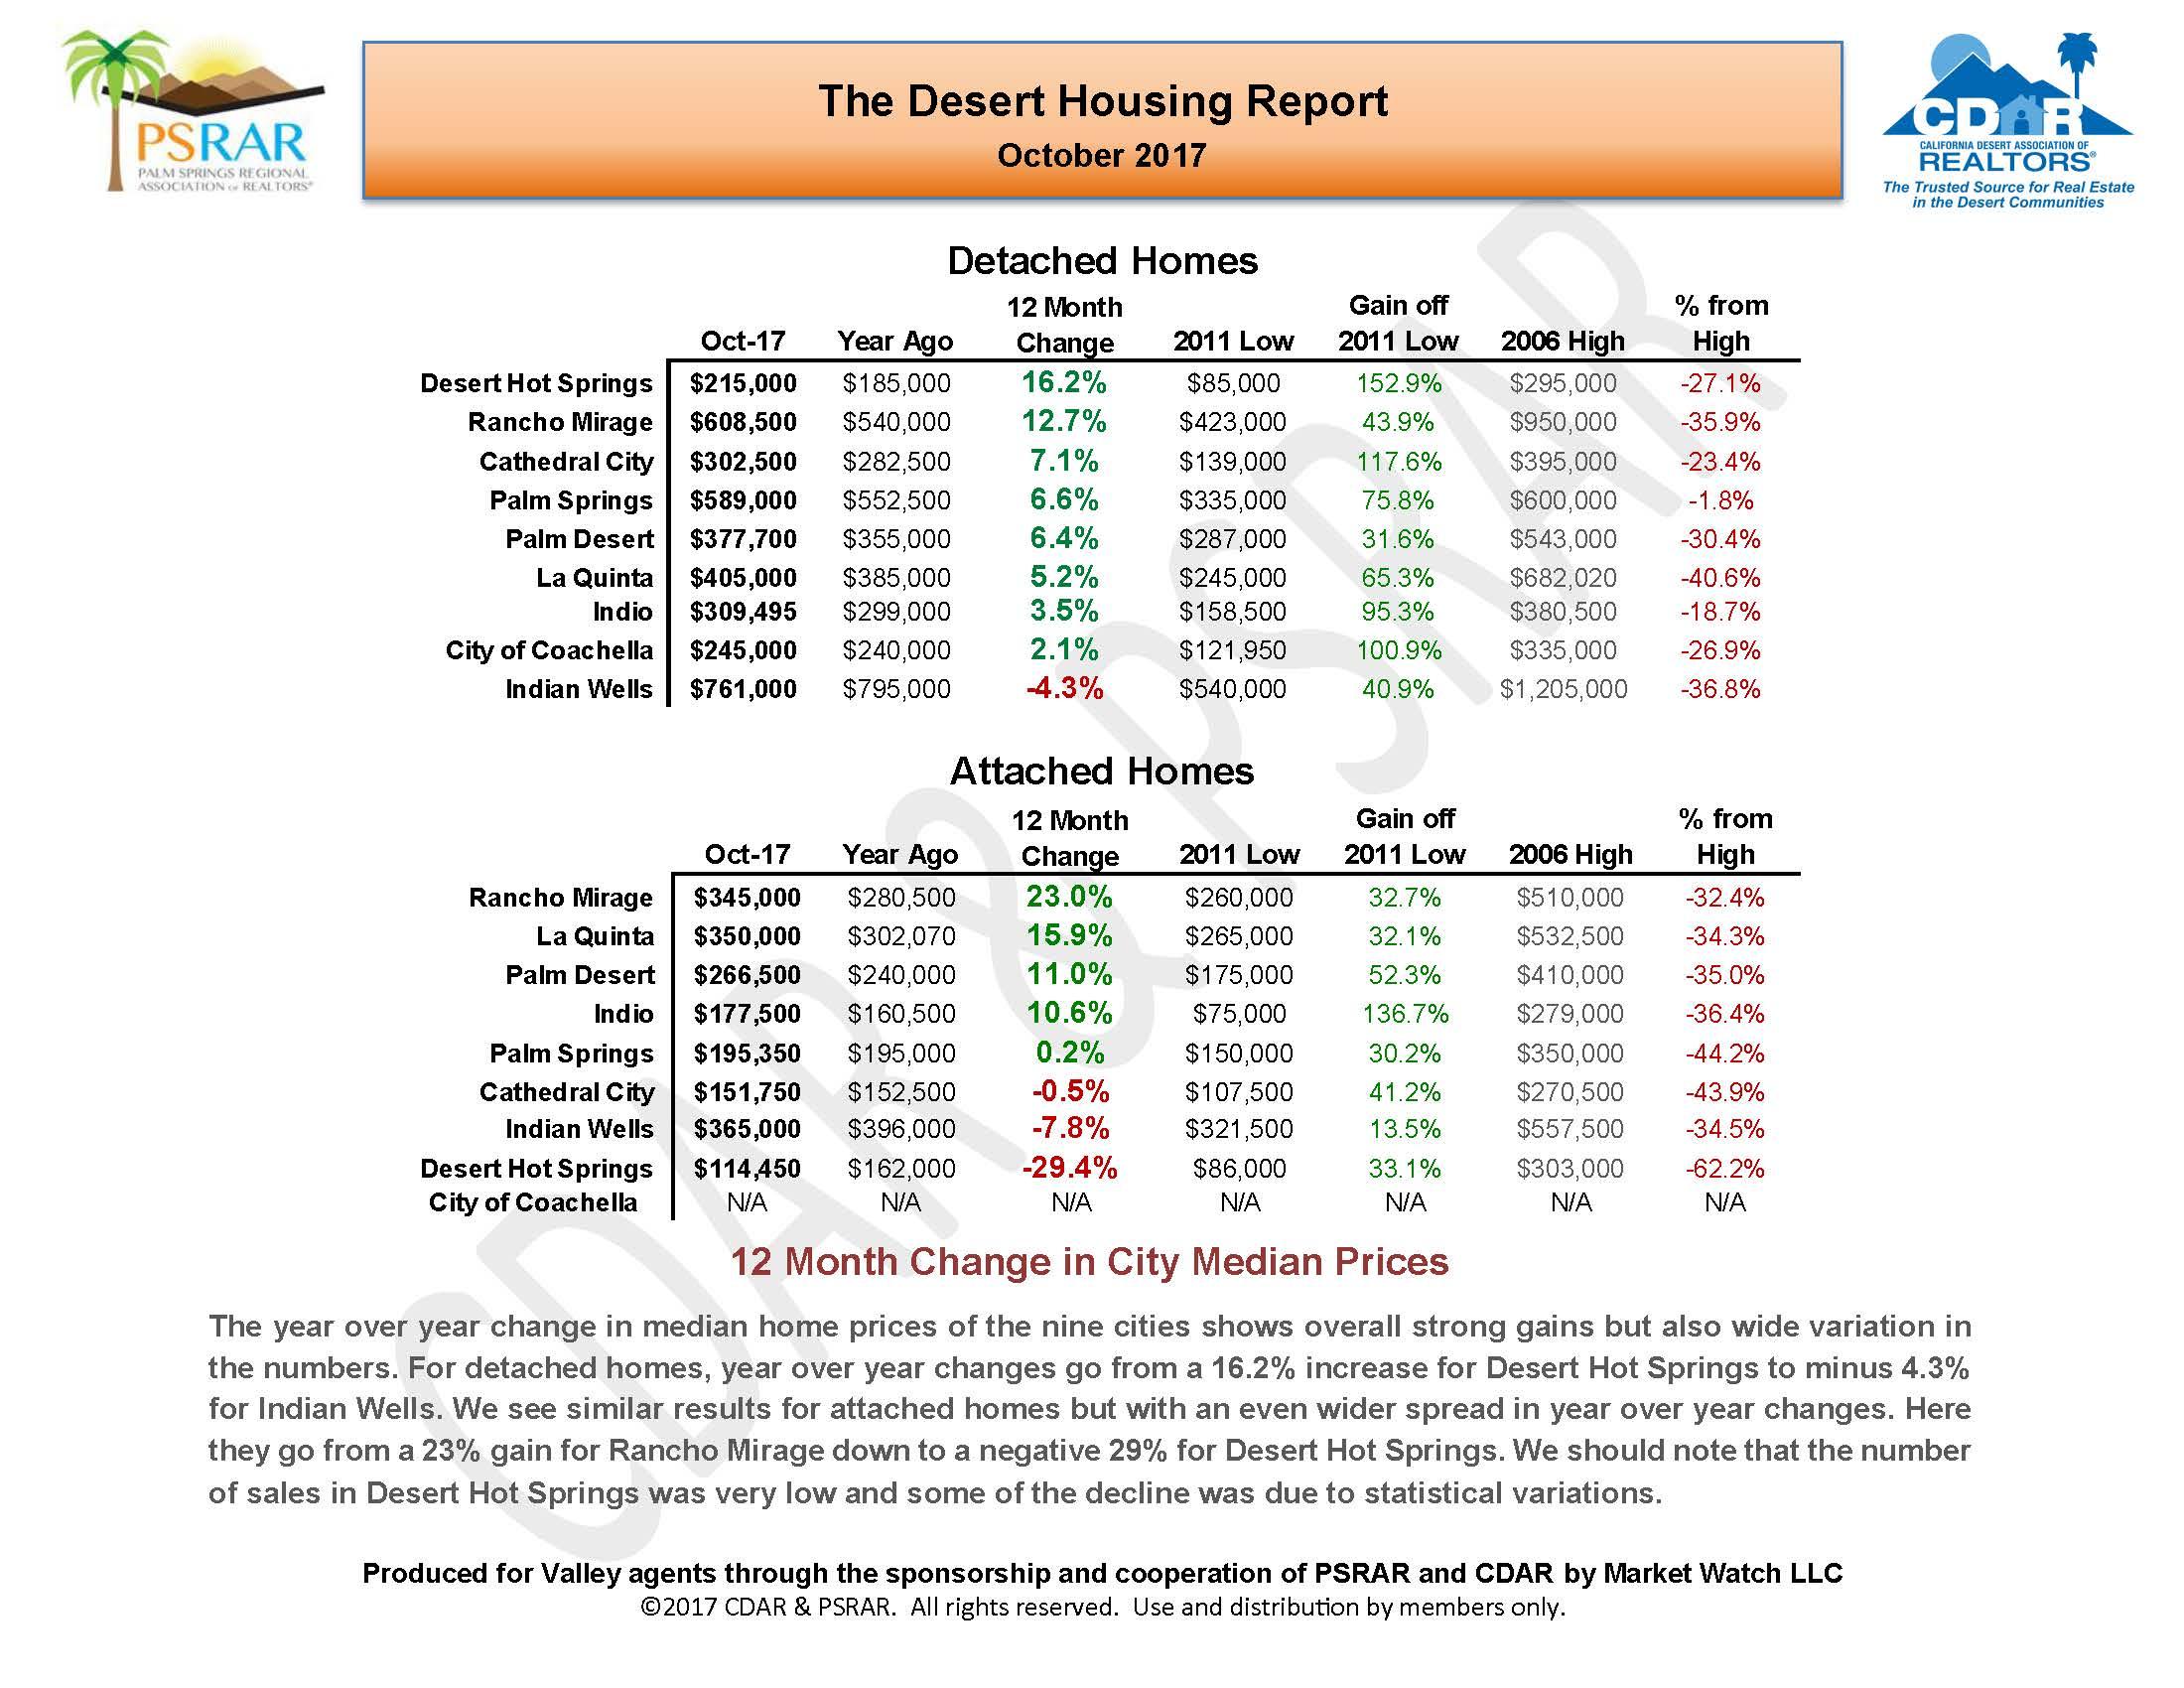 October 2017 Desert Housing Report_Page_03.jpg